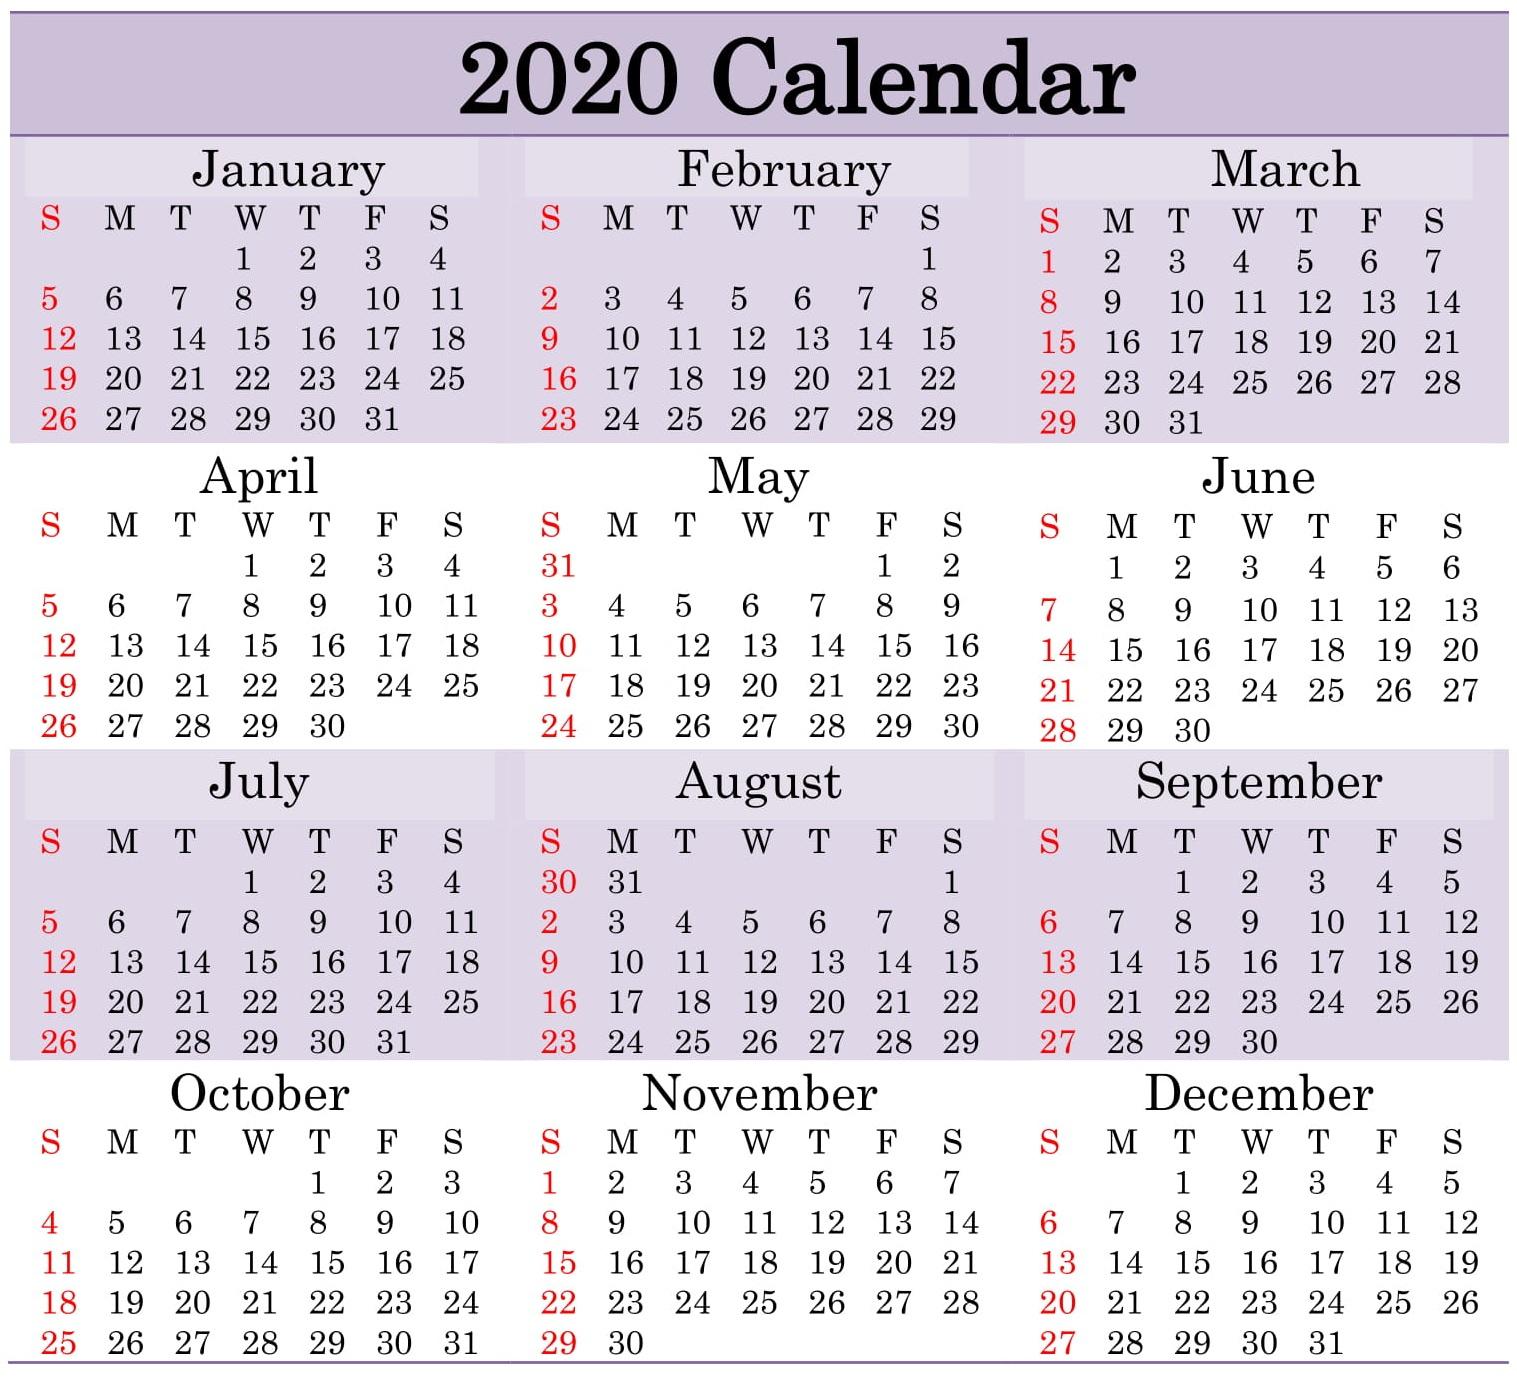 Printable 2020 Calendar Word Document  Latest Printable in Julian Leap Year Calendar